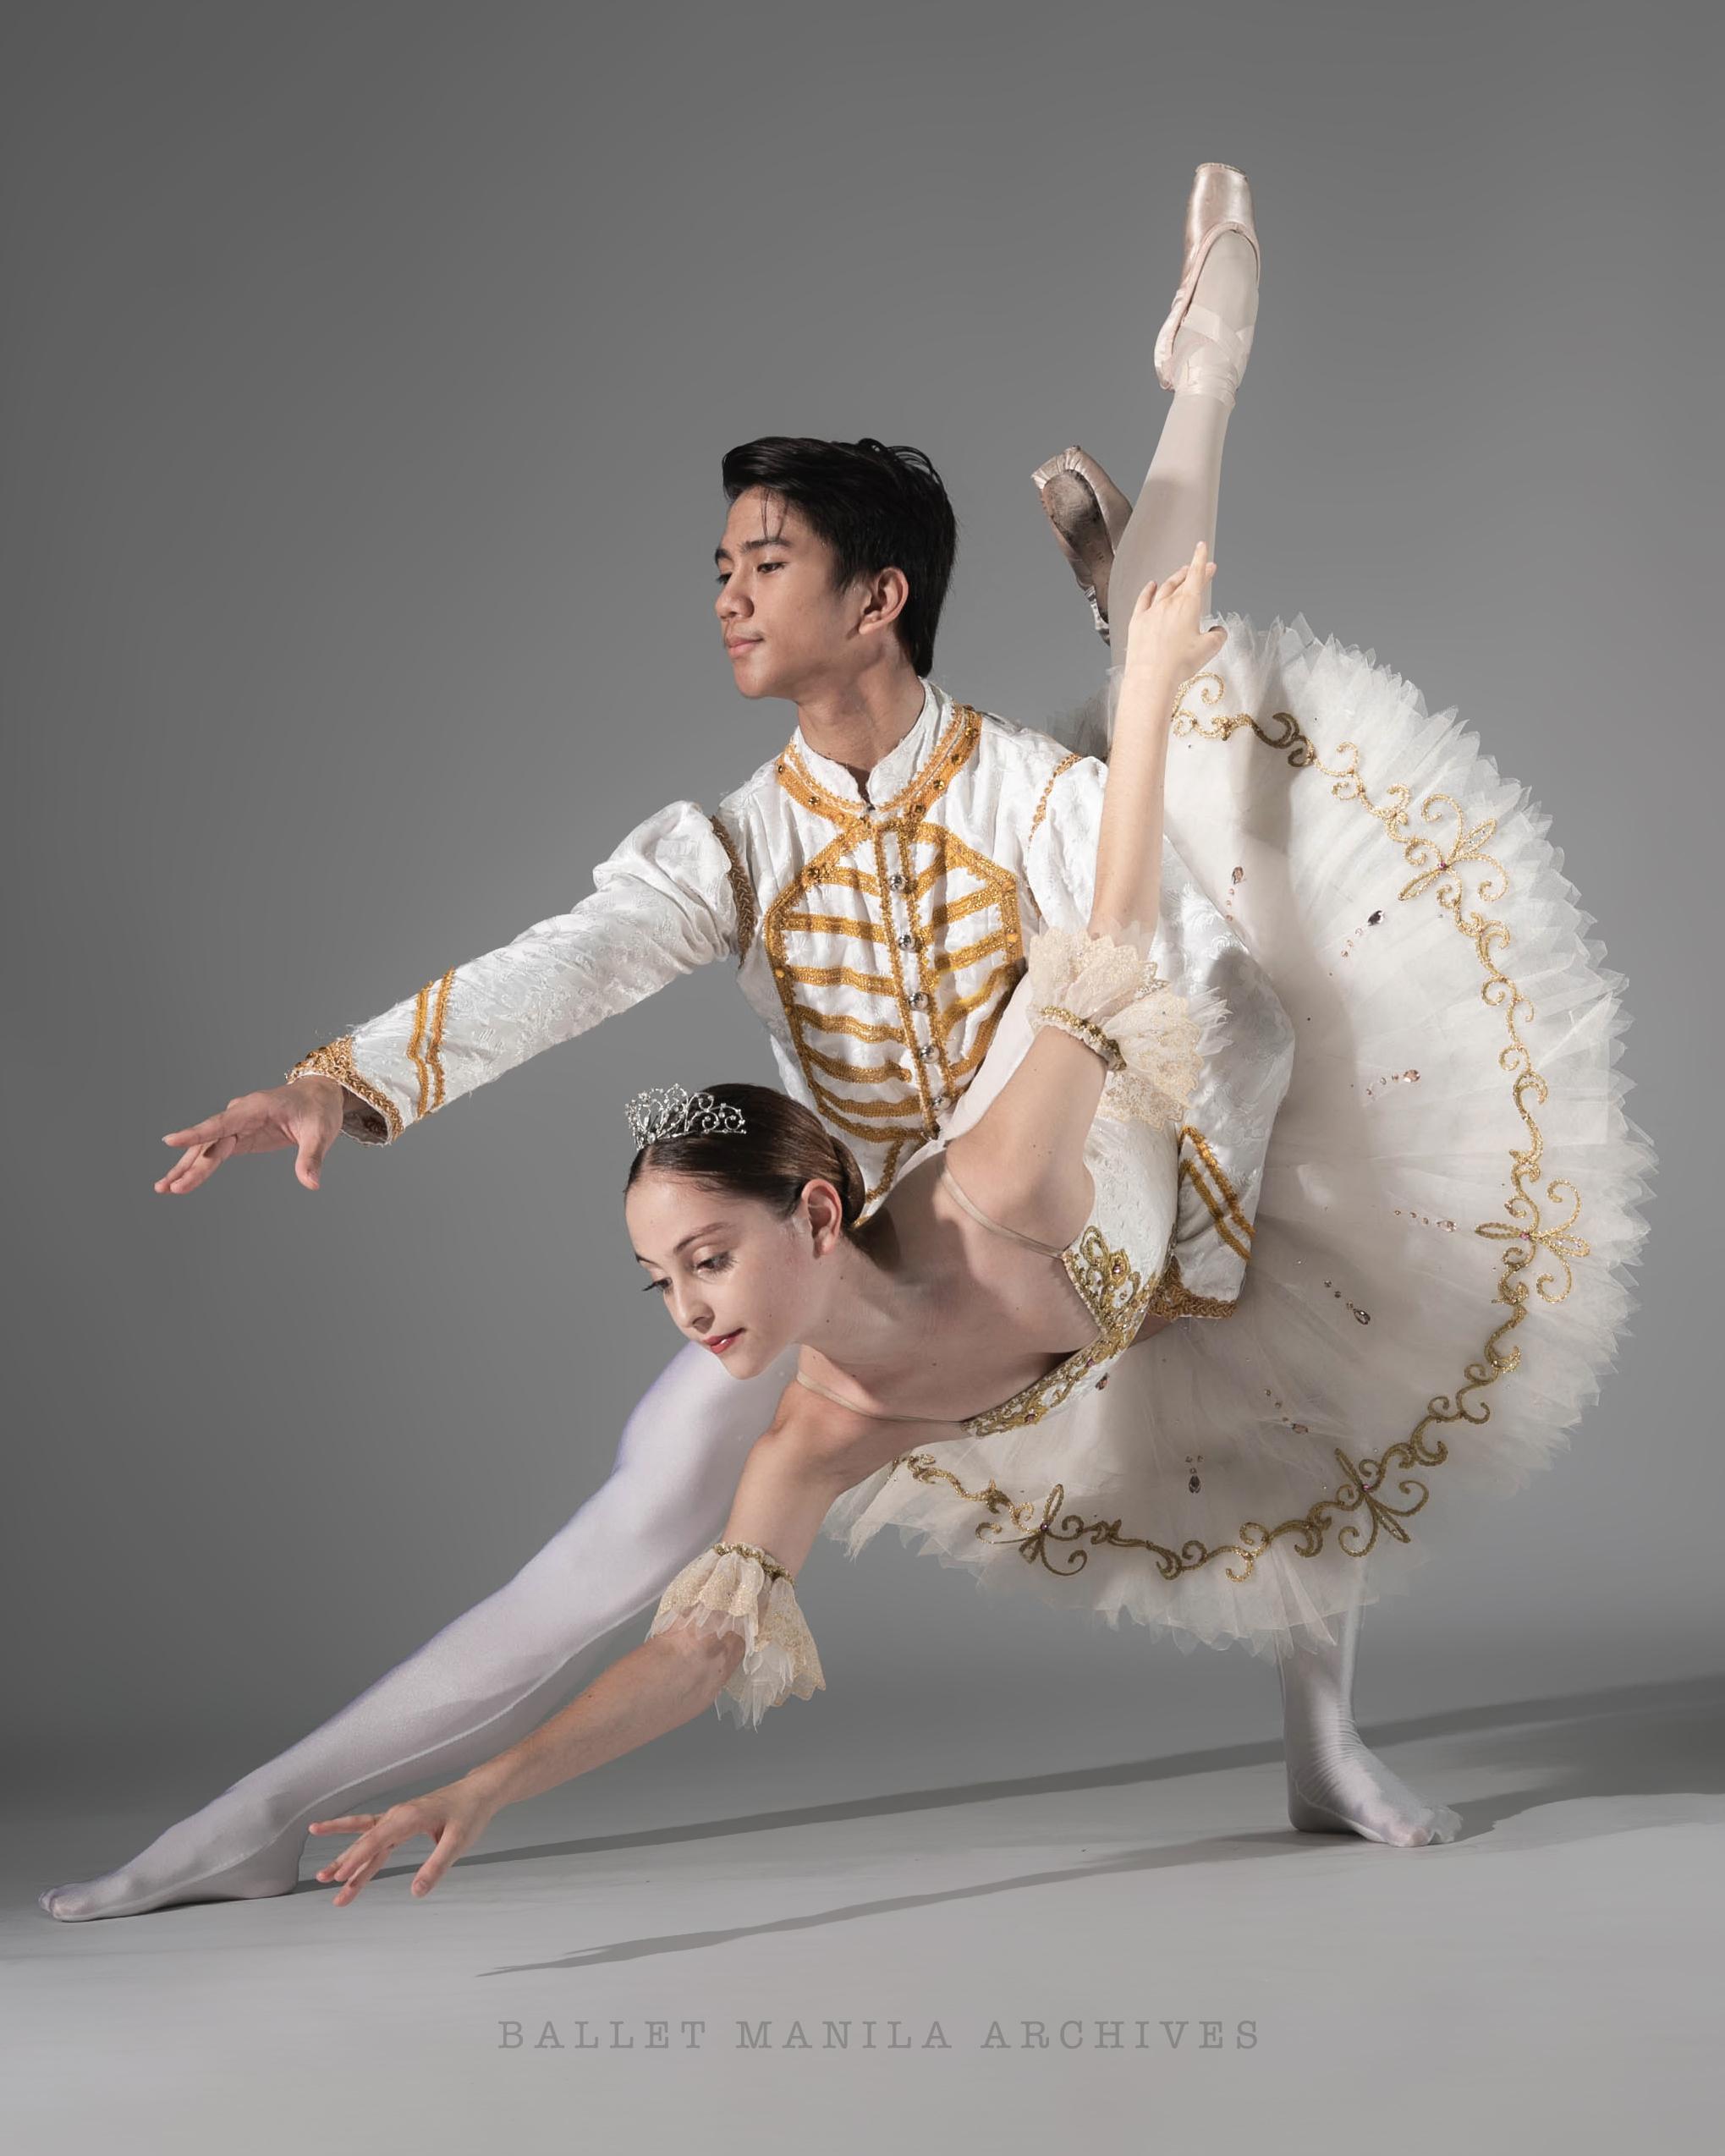 Ballet Dictionary: Fish dive 1 - Ballet Manila Archives